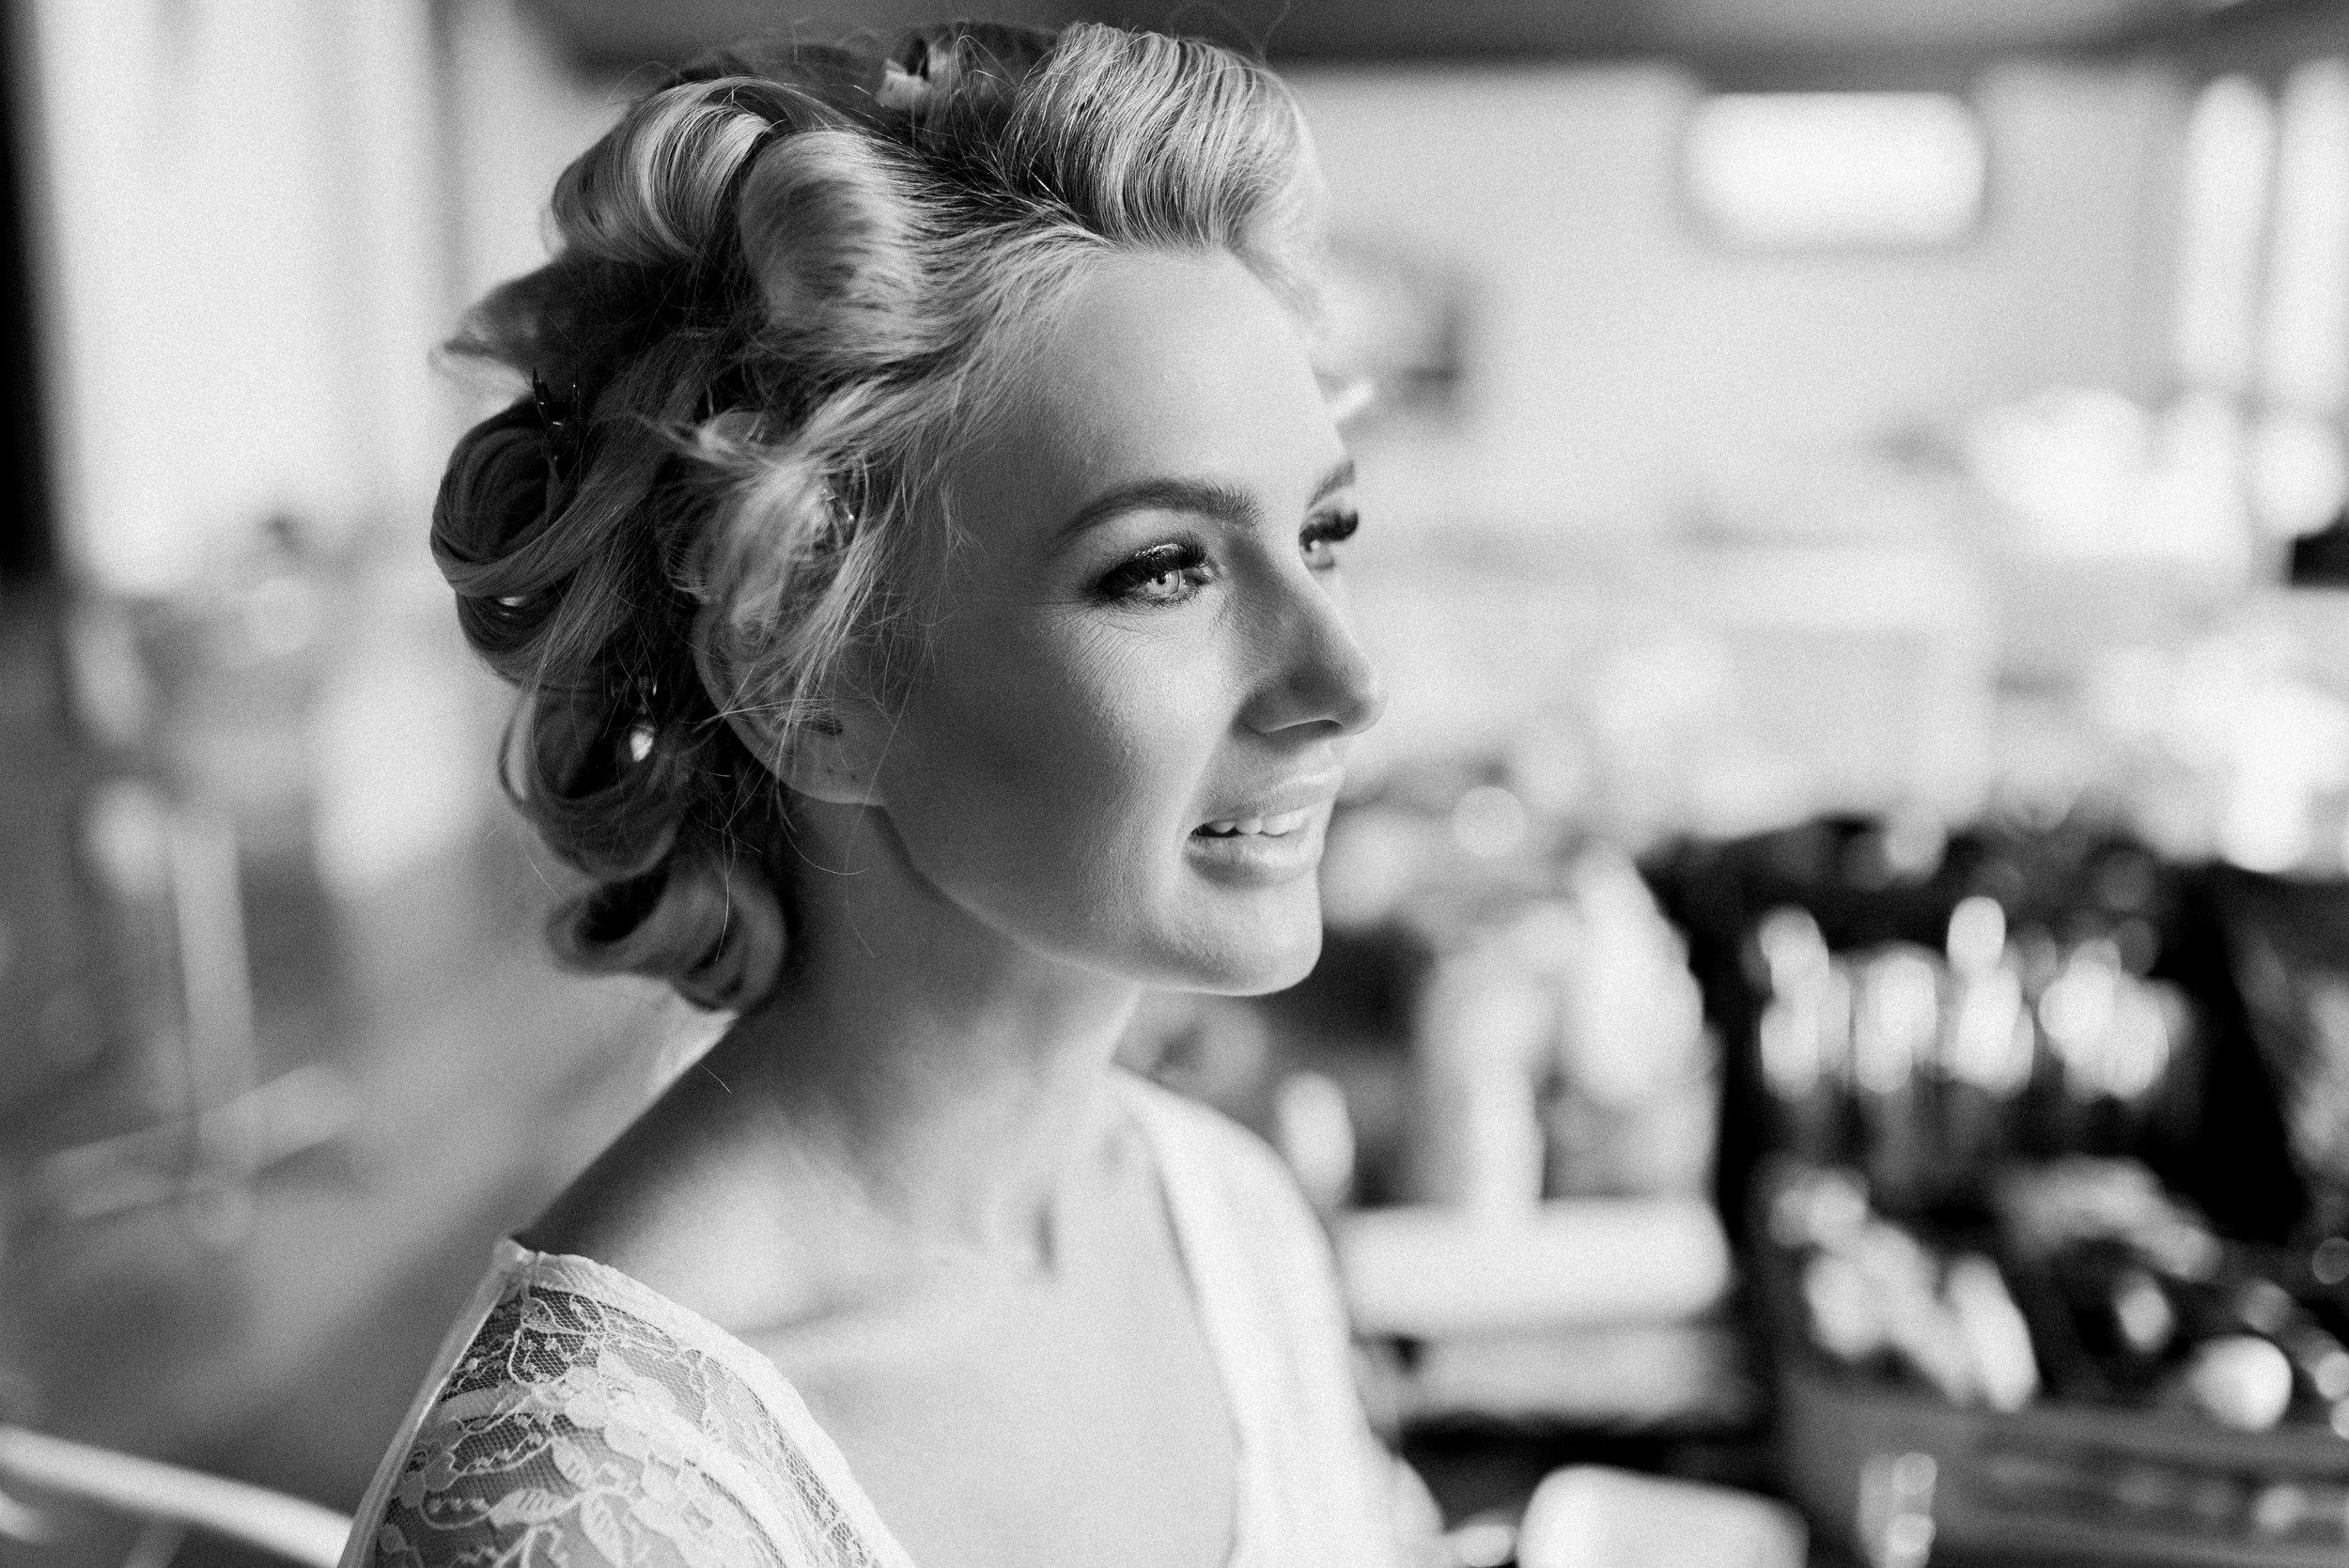 Kooroomba-Vineyard-Lavender-Farm-Wedding-Fine-Art-Lauren-Olivia-6.jpg